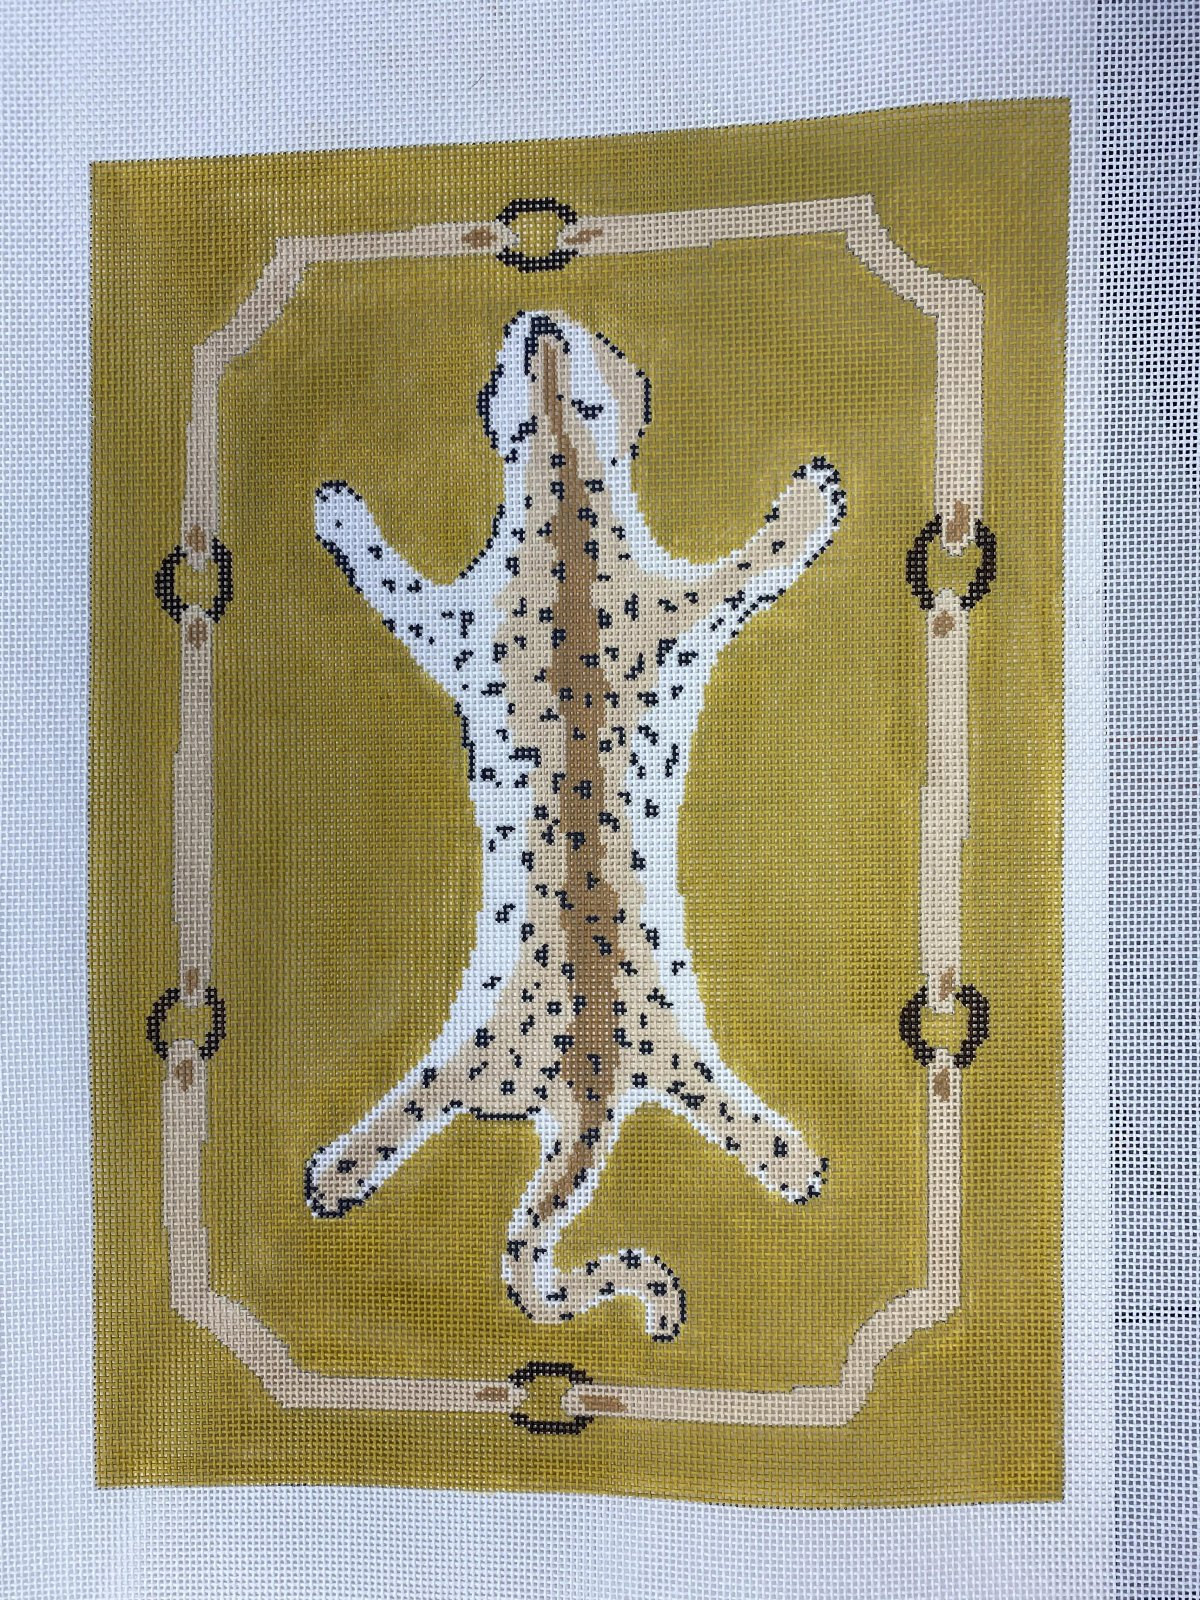 Leopard Clutch on Yellow